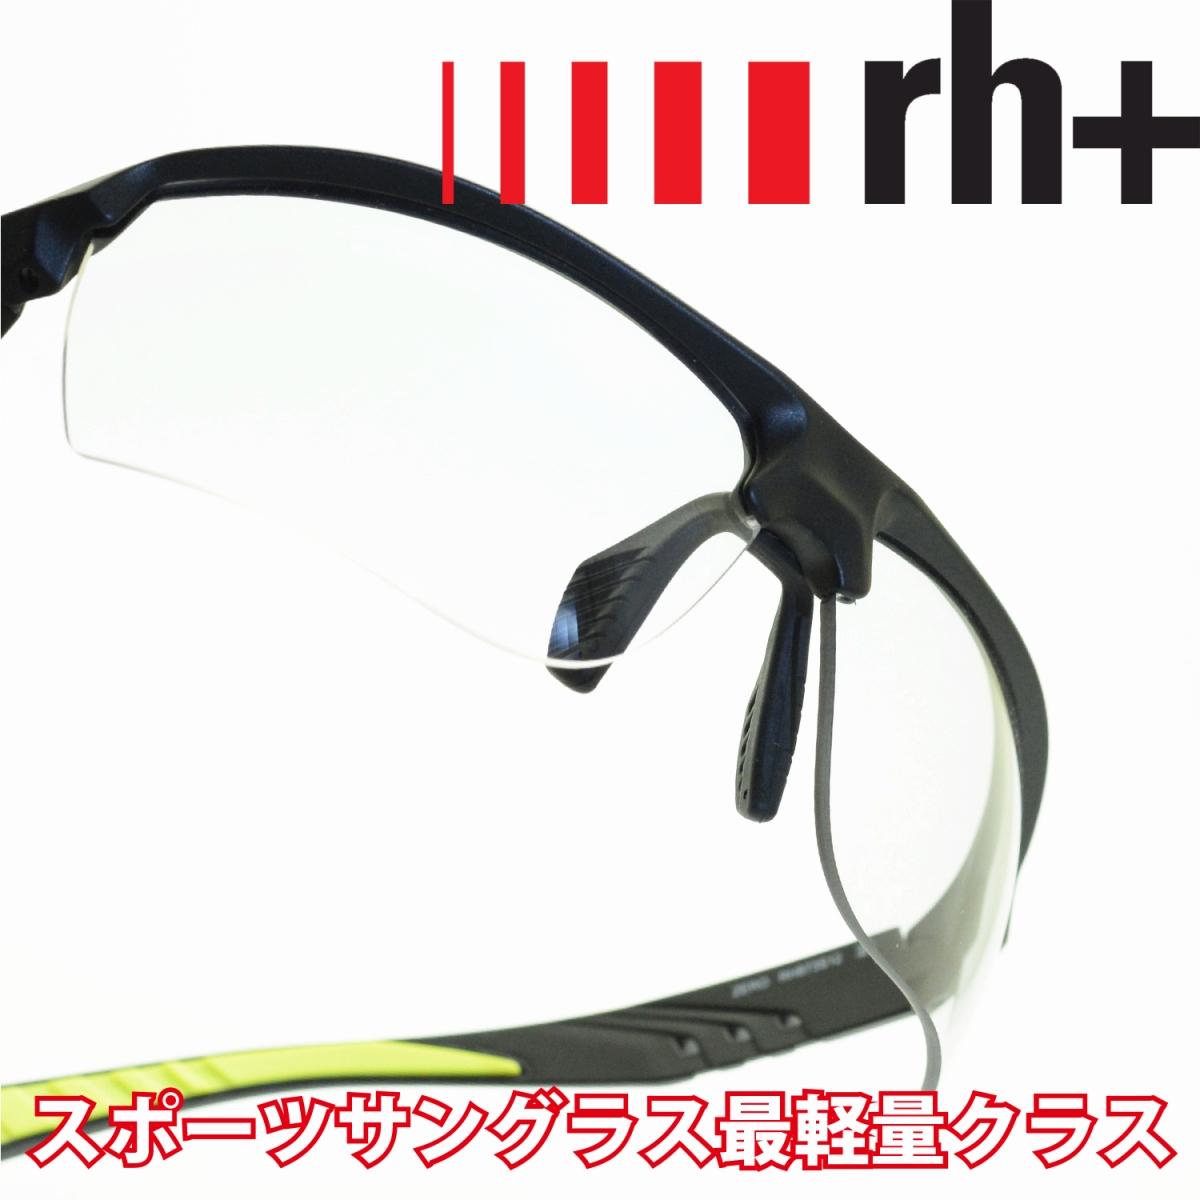 rh+ アールエイチプラス ZERO RH873S12メガネ 眼鏡 めがね メンズ レディース おしゃれ ブランド 人気 おすすめ フレーム 流行り 度付き レンズ サングラス スポーツ